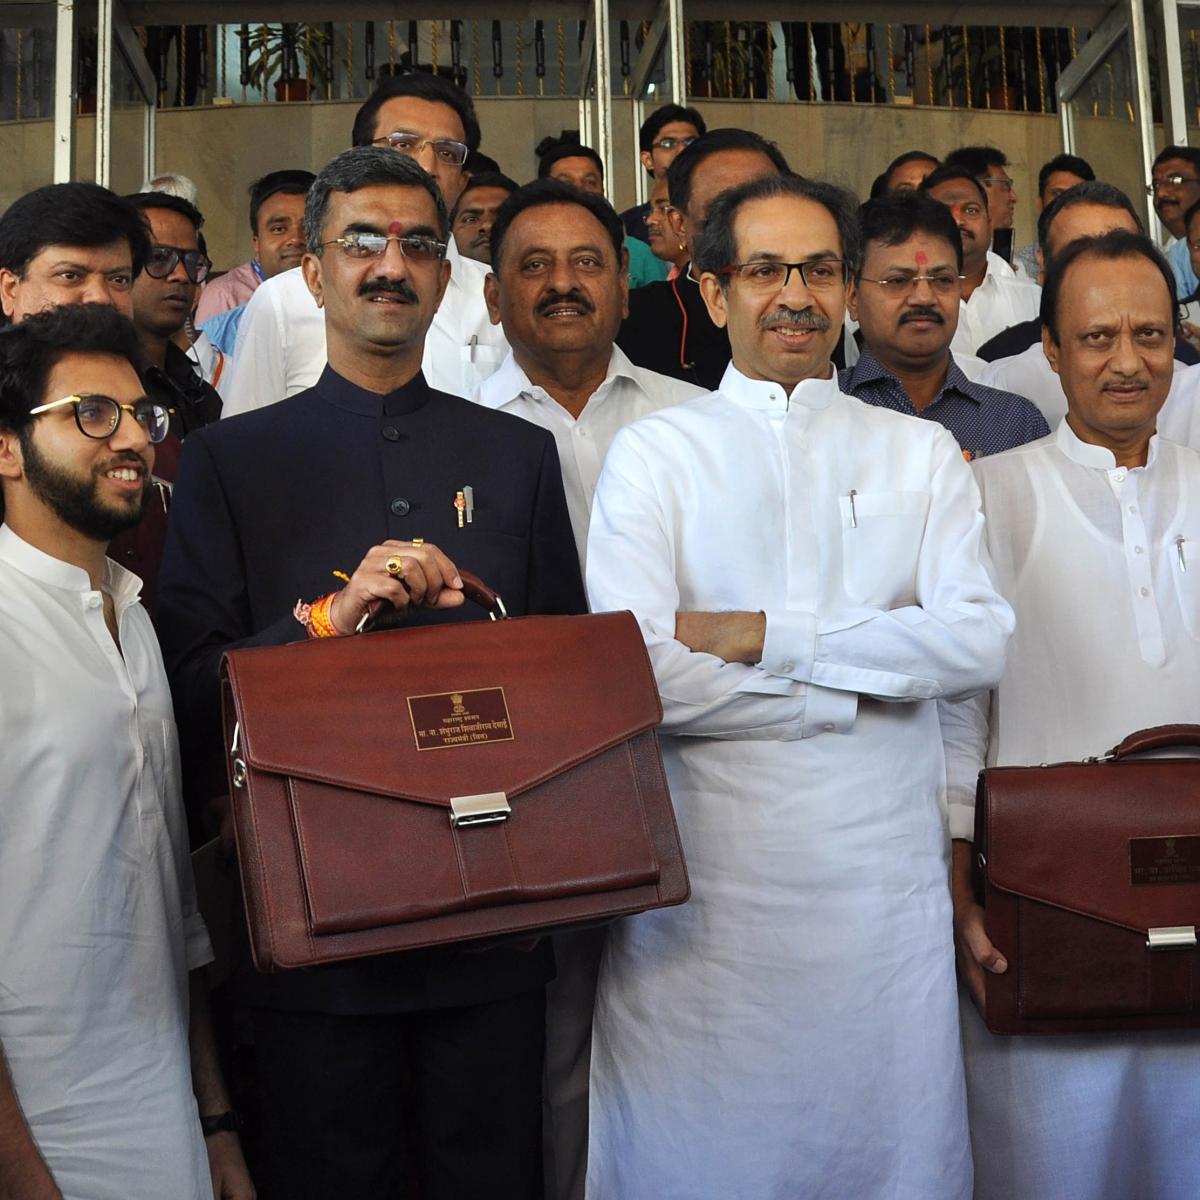 Maharashtra CM Uddhav Thackeray to file nomination for state legislative council at 12 noon